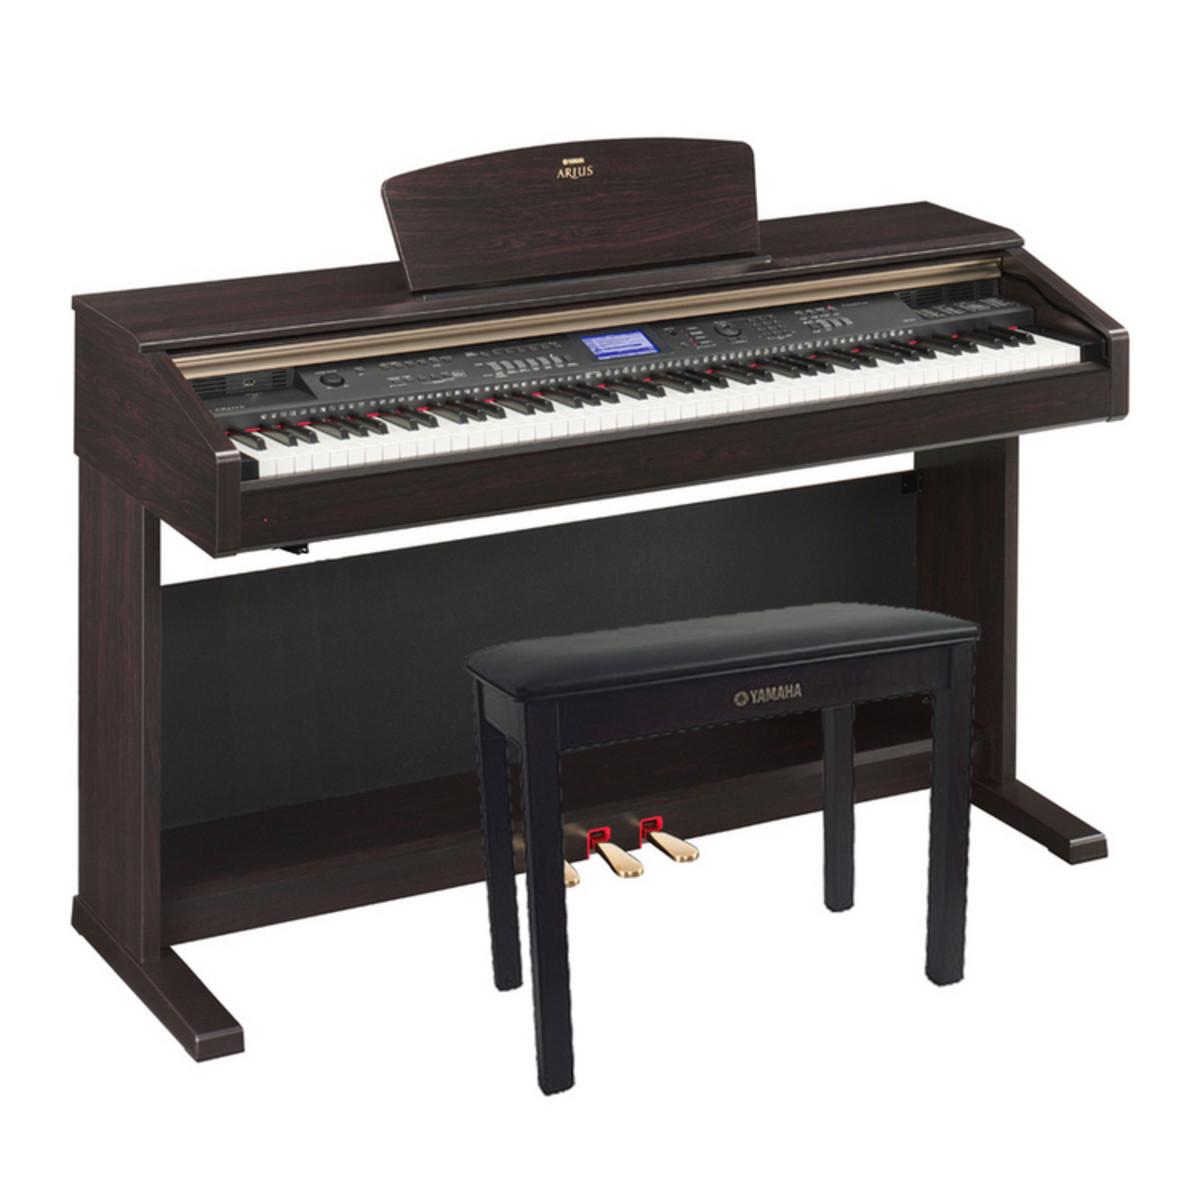 disc yamaha arius ydp v240 digital piano dark rosewood bench at gear4music. Black Bedroom Furniture Sets. Home Design Ideas